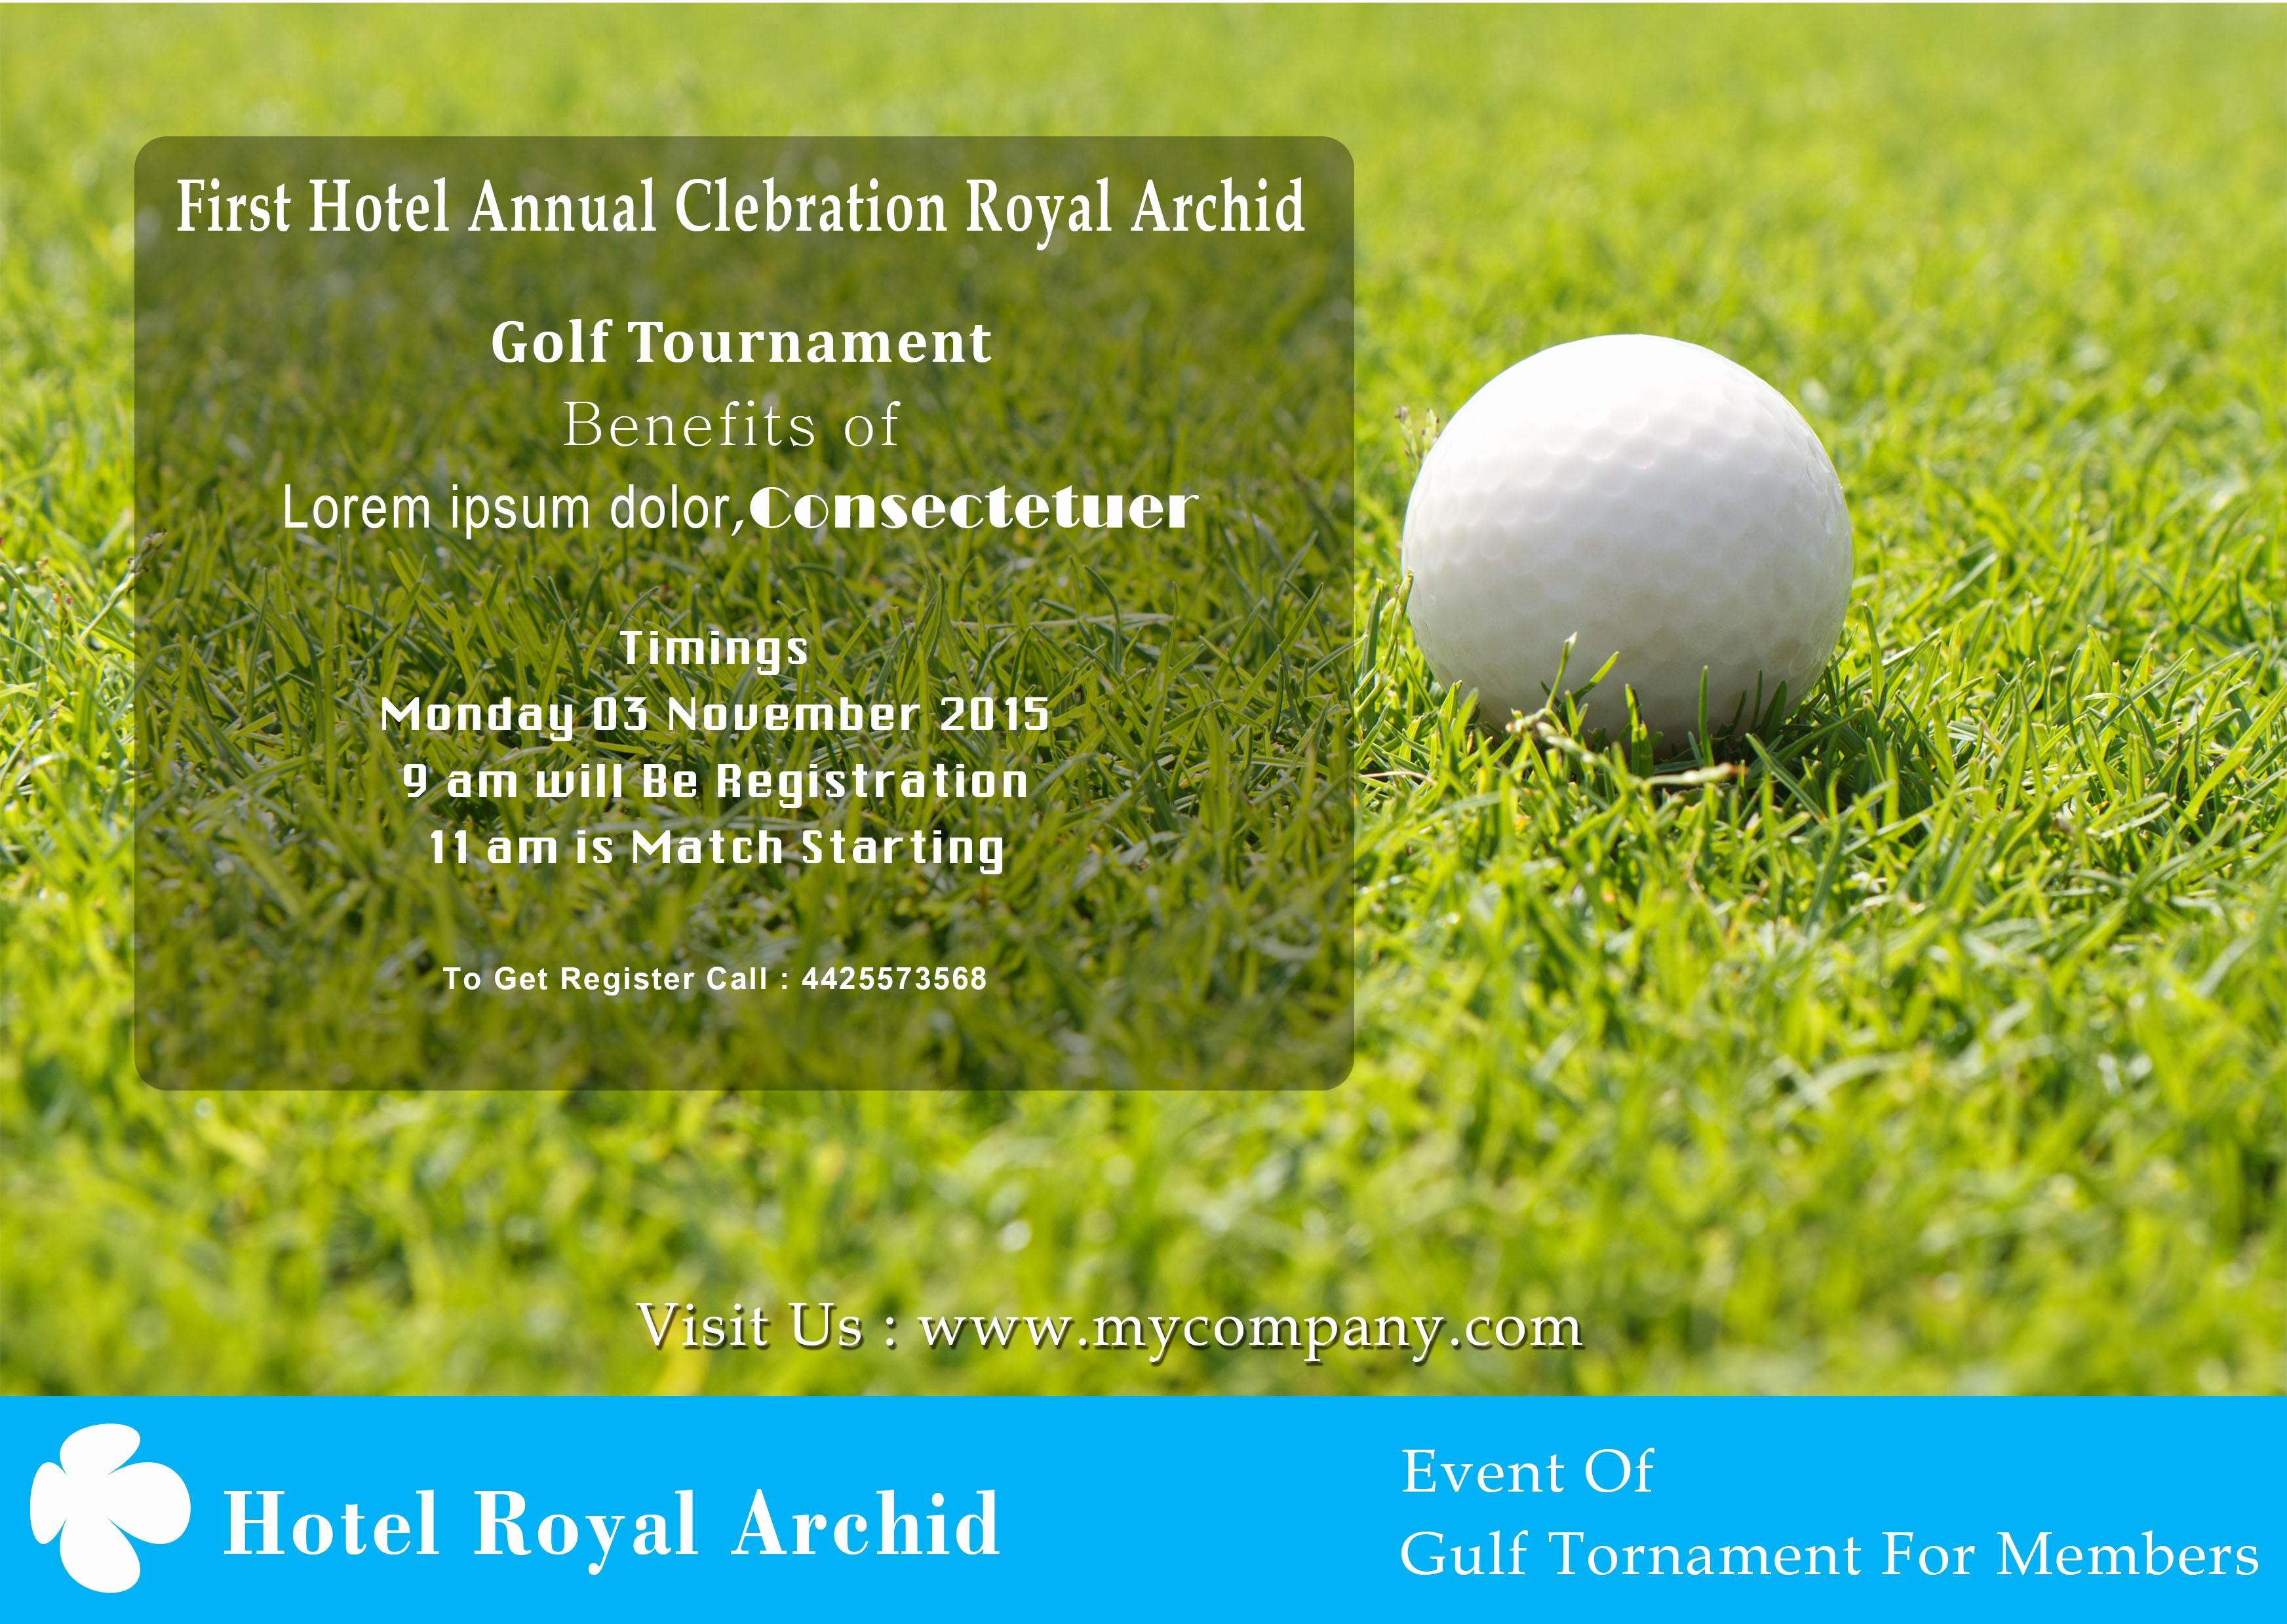 Golf tournament Flyer Template Word Luxury 15 Free Golf tournament Flyer Templates Fundraiser